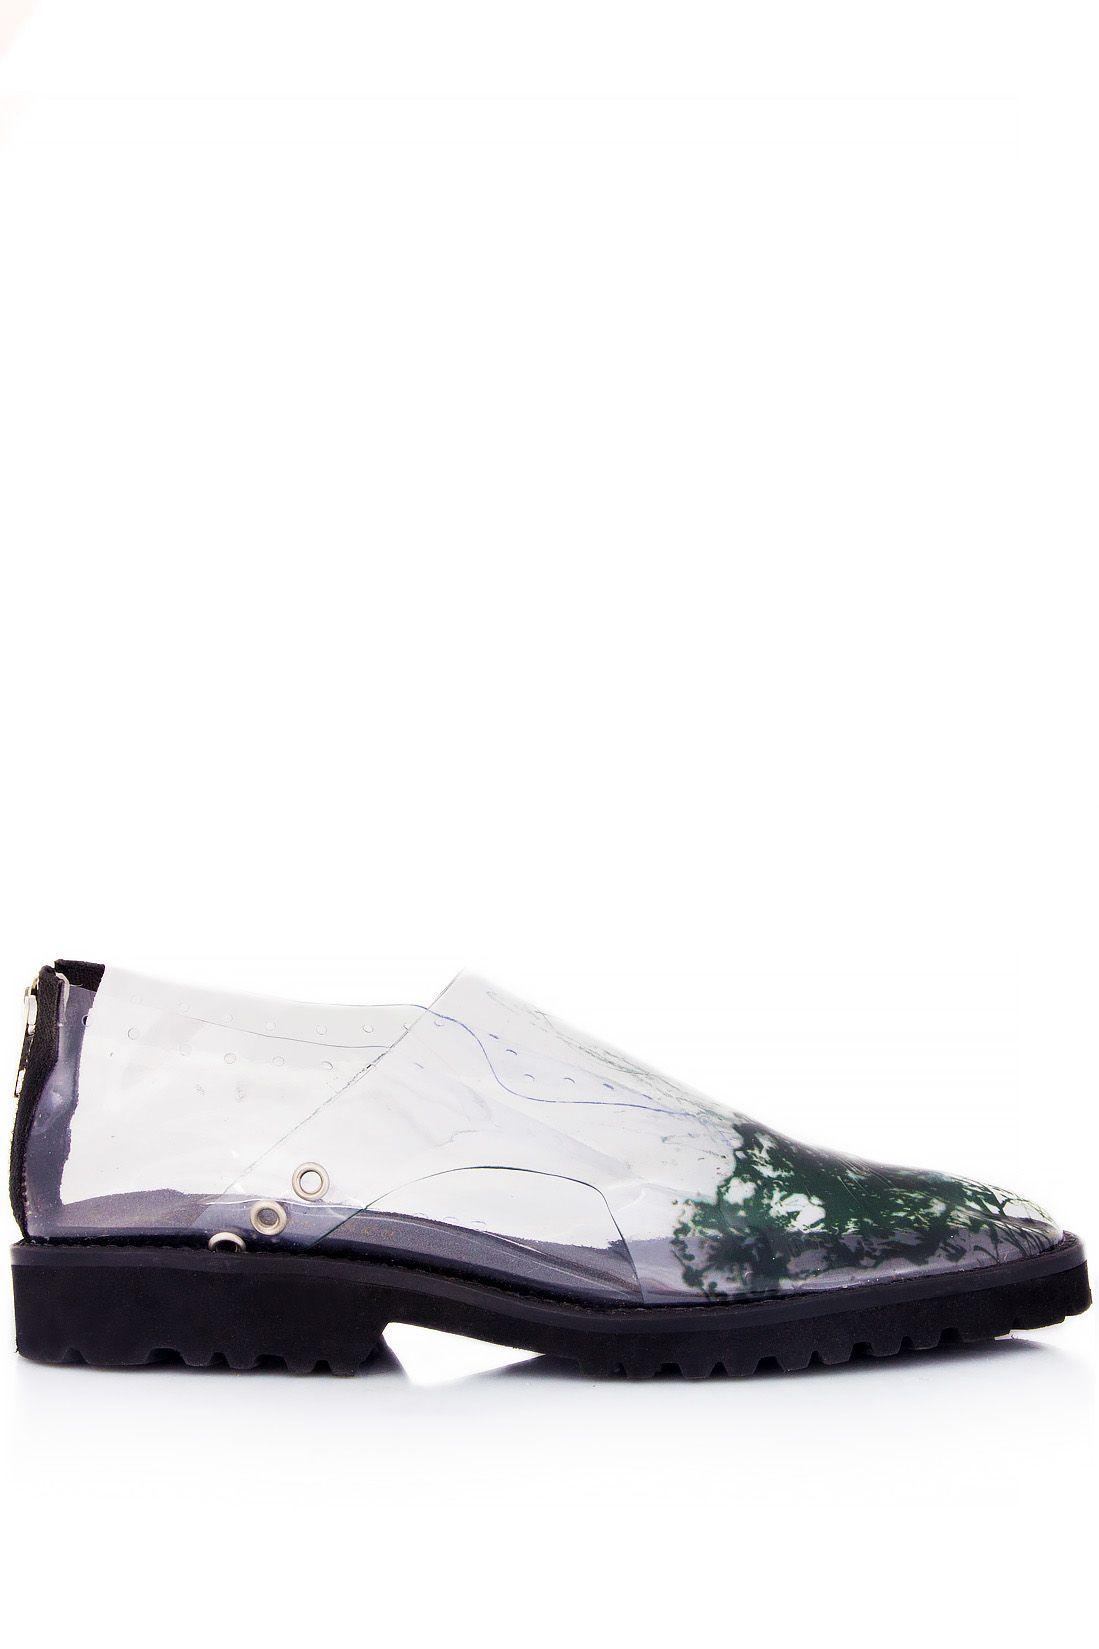 Monocrystal Transparent Shoes | Bianca Georgescu | NOT JUST A LABEL